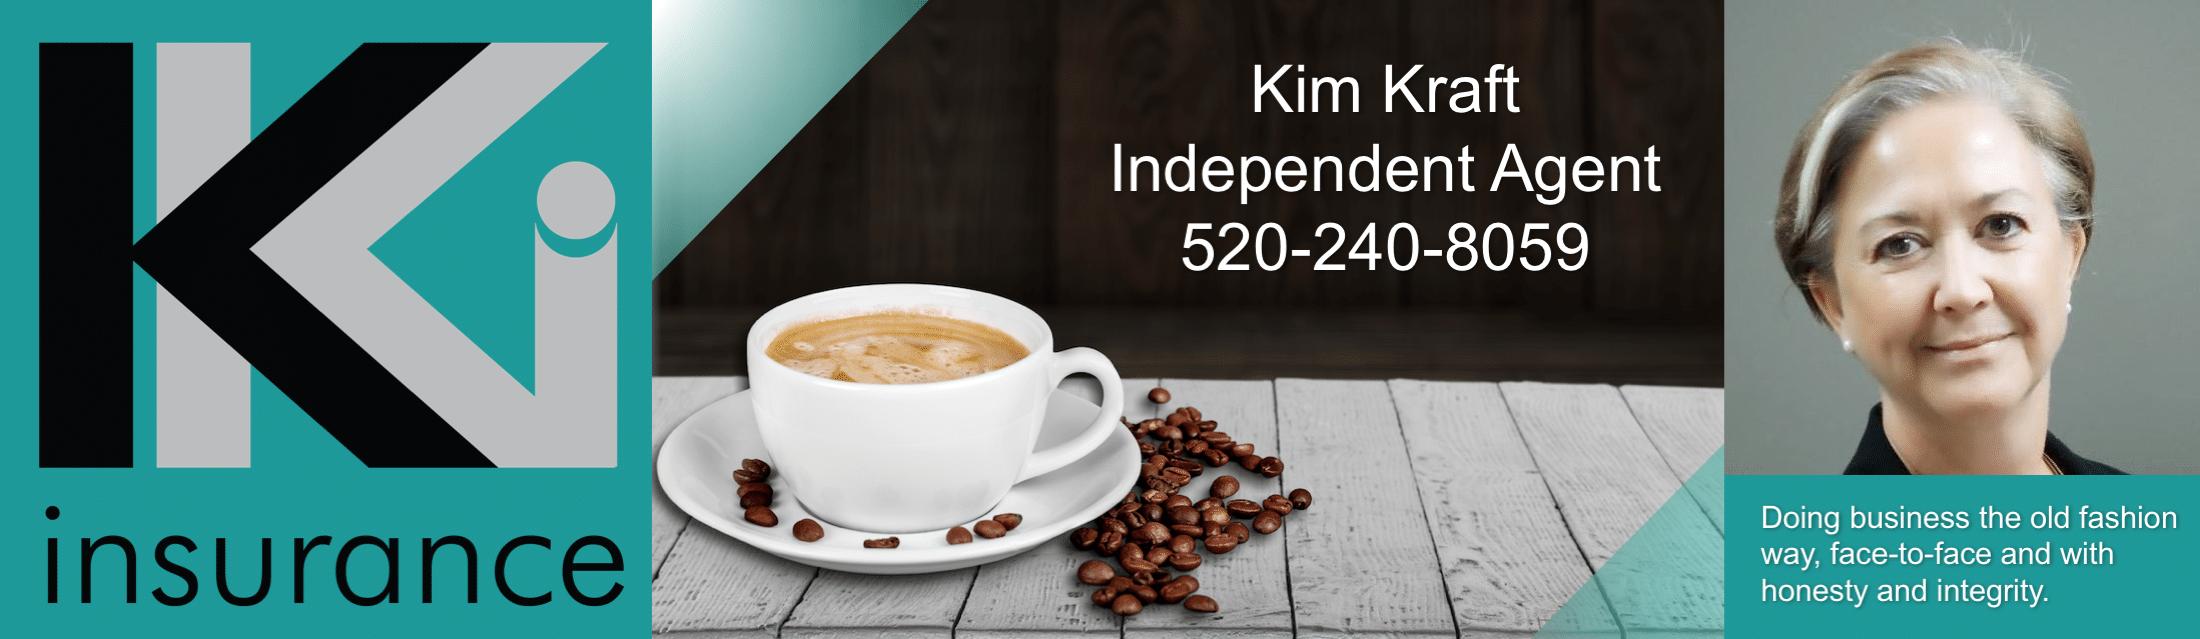 https://kimkraftinsurance.com/wp-content/uploads/2017/02/Health-Insurance-Arizona-Health-Insurance-Agent-Arizona-Kim-Kraft-Insurance-1.png